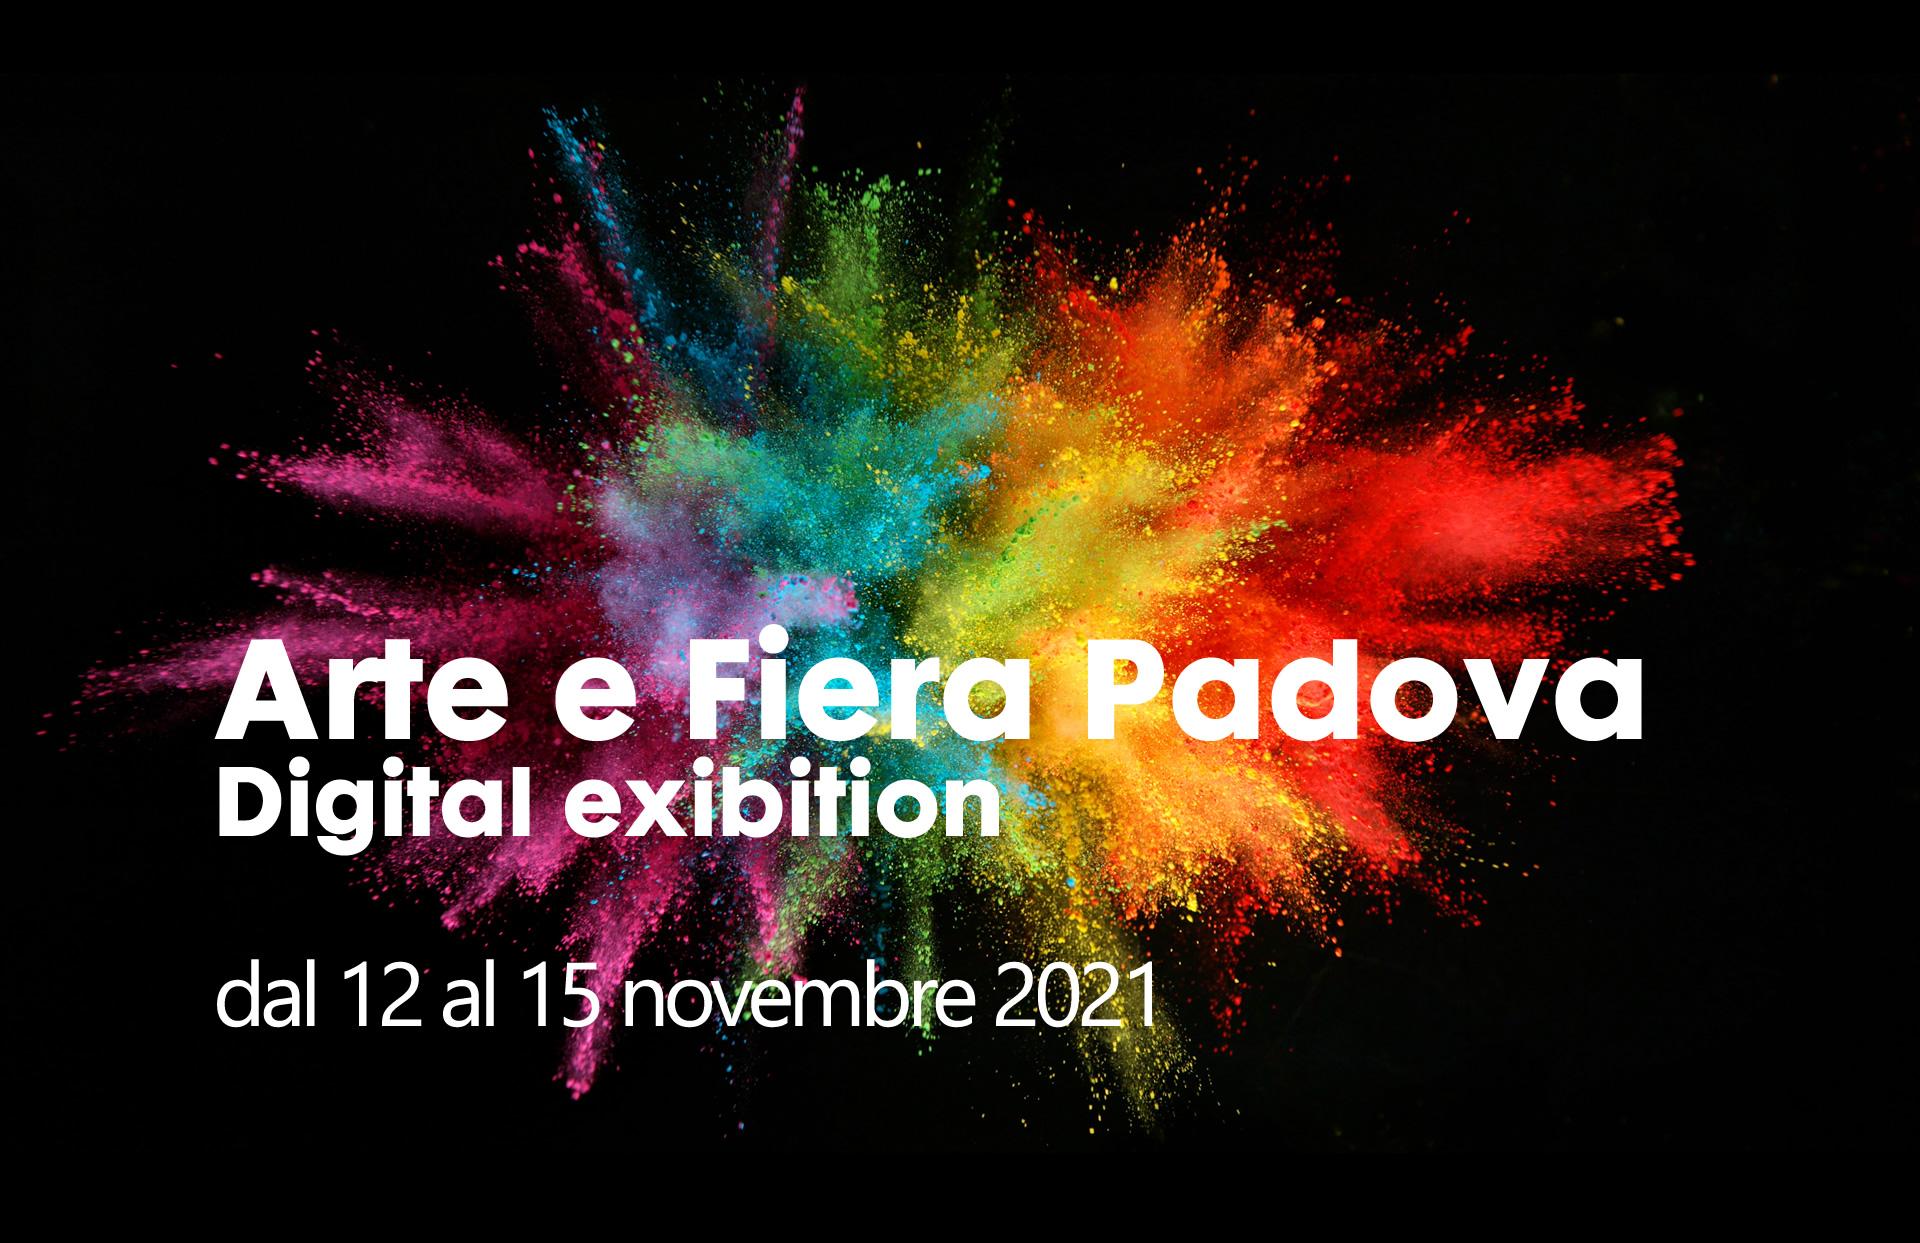 Arte e Fiera Padova – Digital exibition